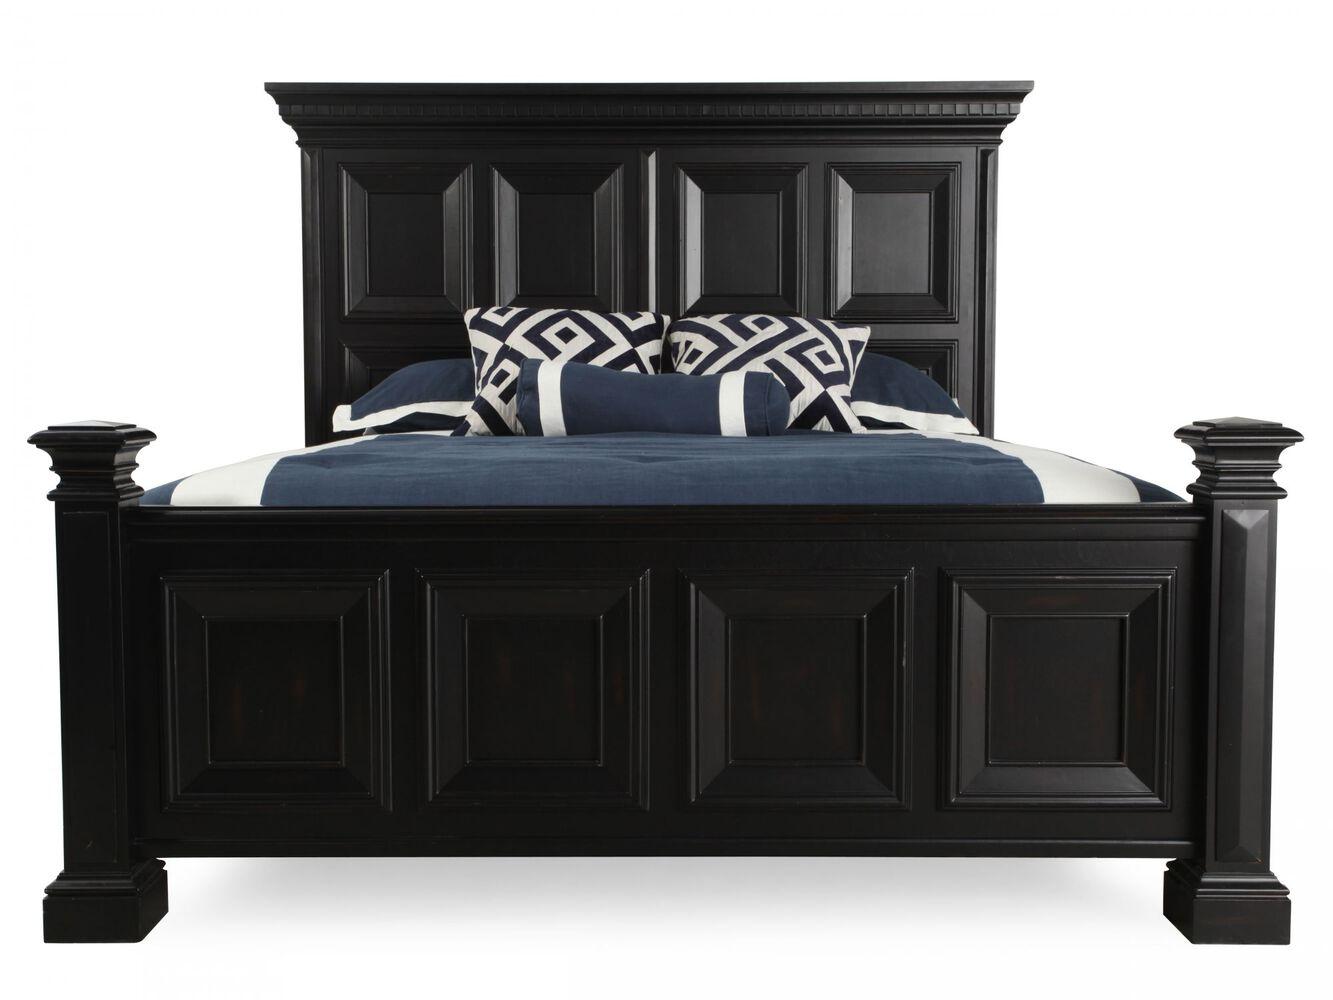 pulaski brookfield panel bed mathis brothers furniture. Black Bedroom Furniture Sets. Home Design Ideas